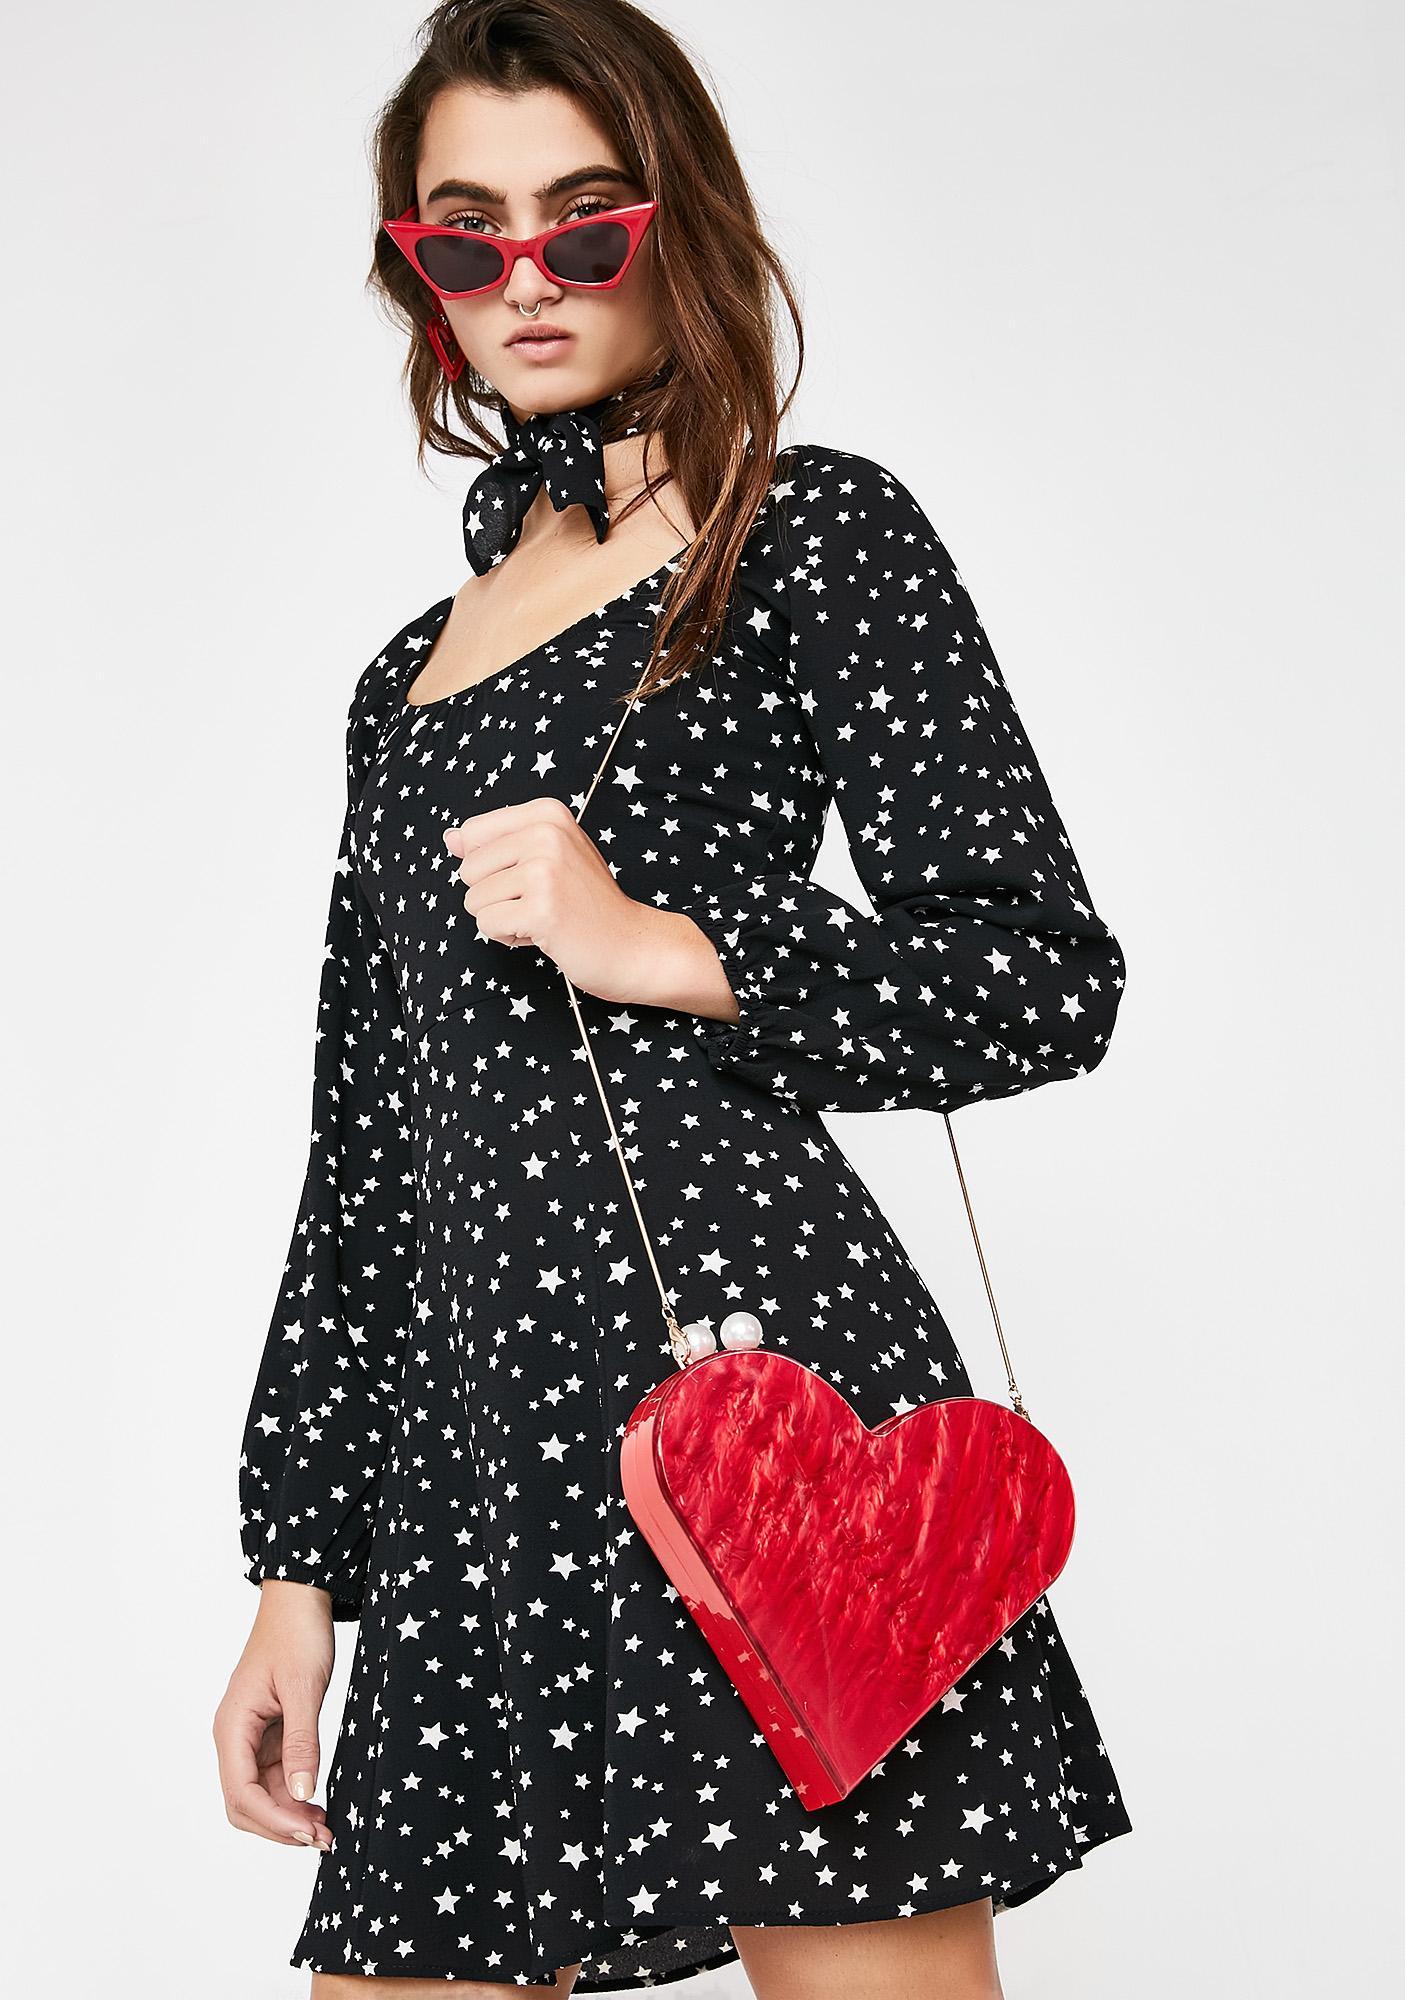 Heart Of Stone Crossbody Bag